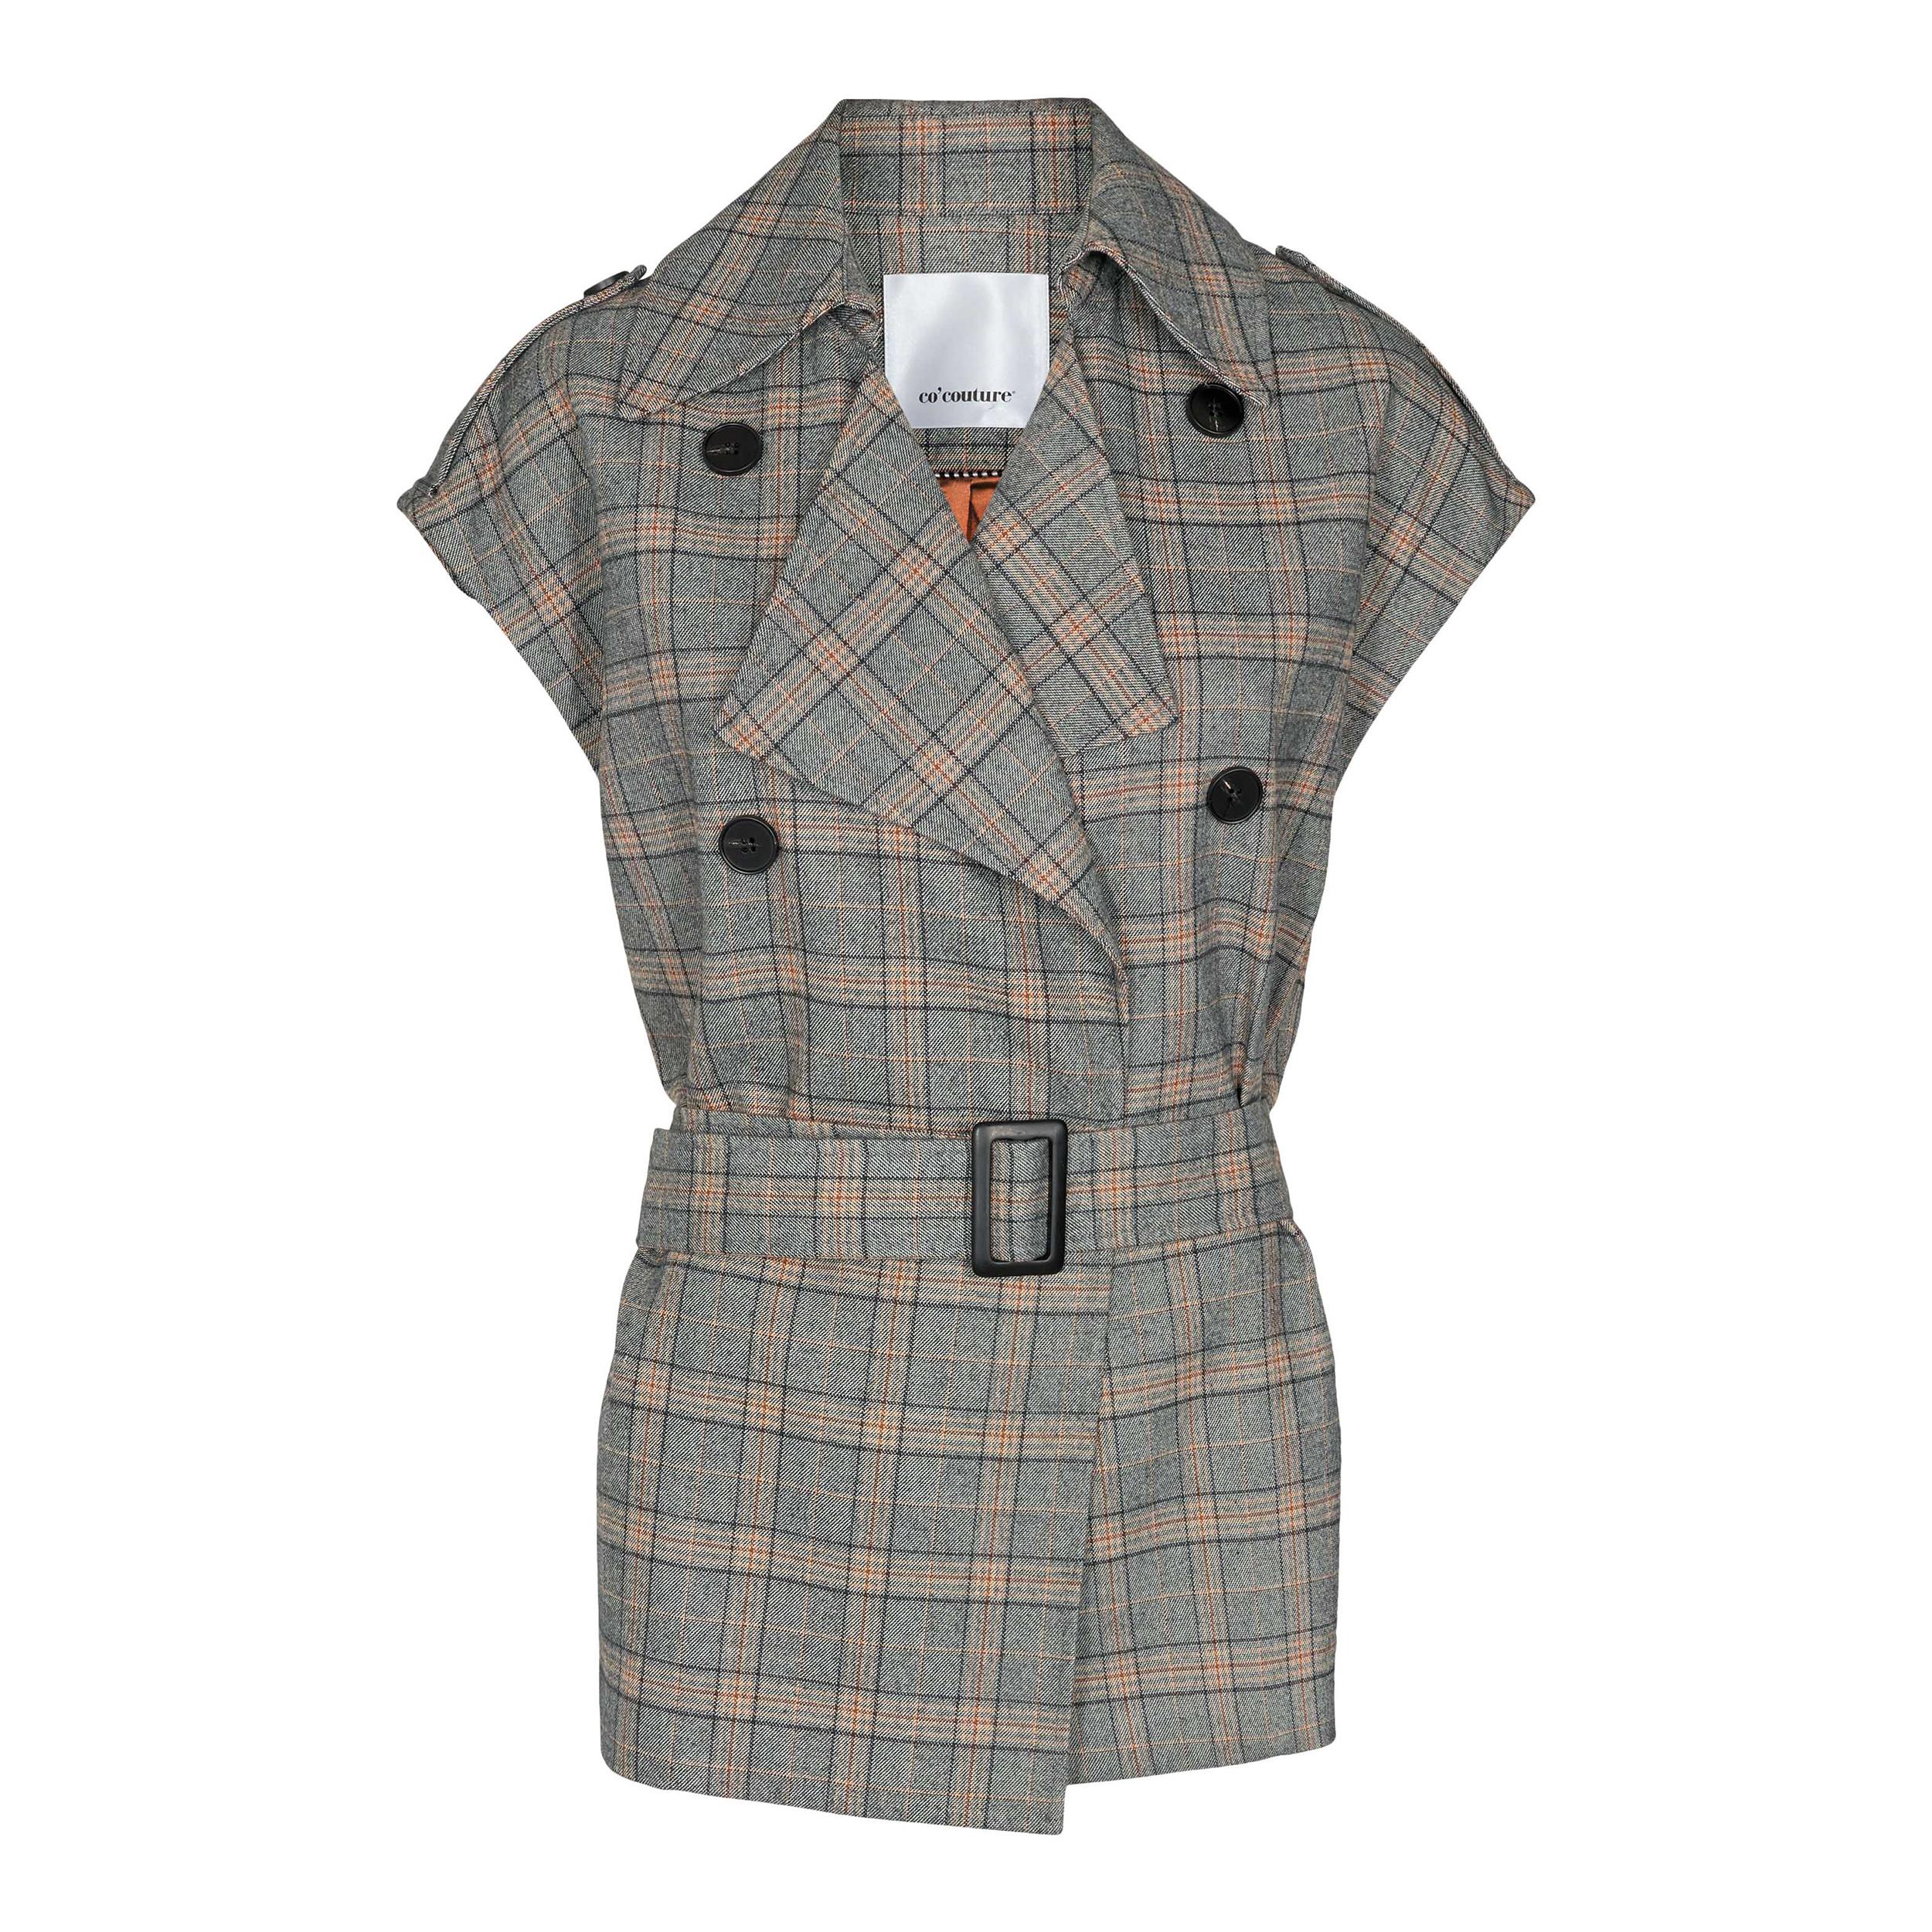 Co'Couture Panama Check vest